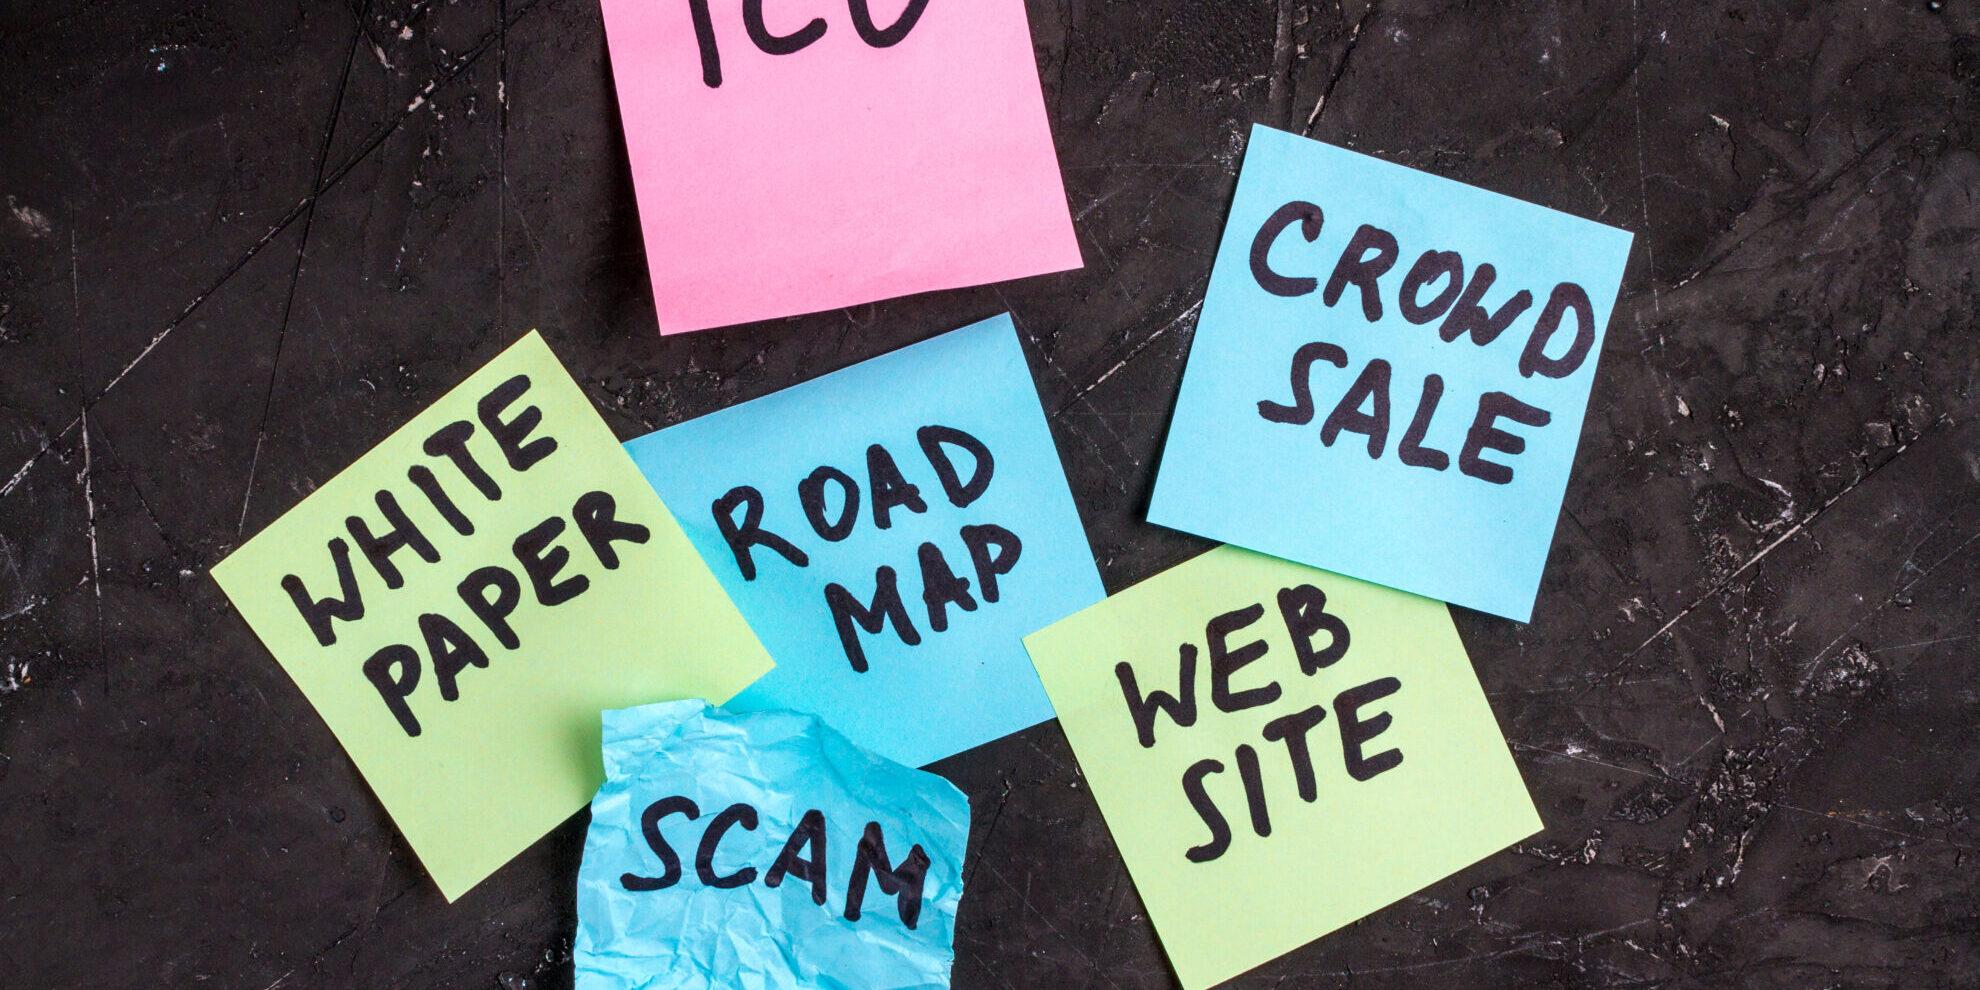 ico scam sticky note